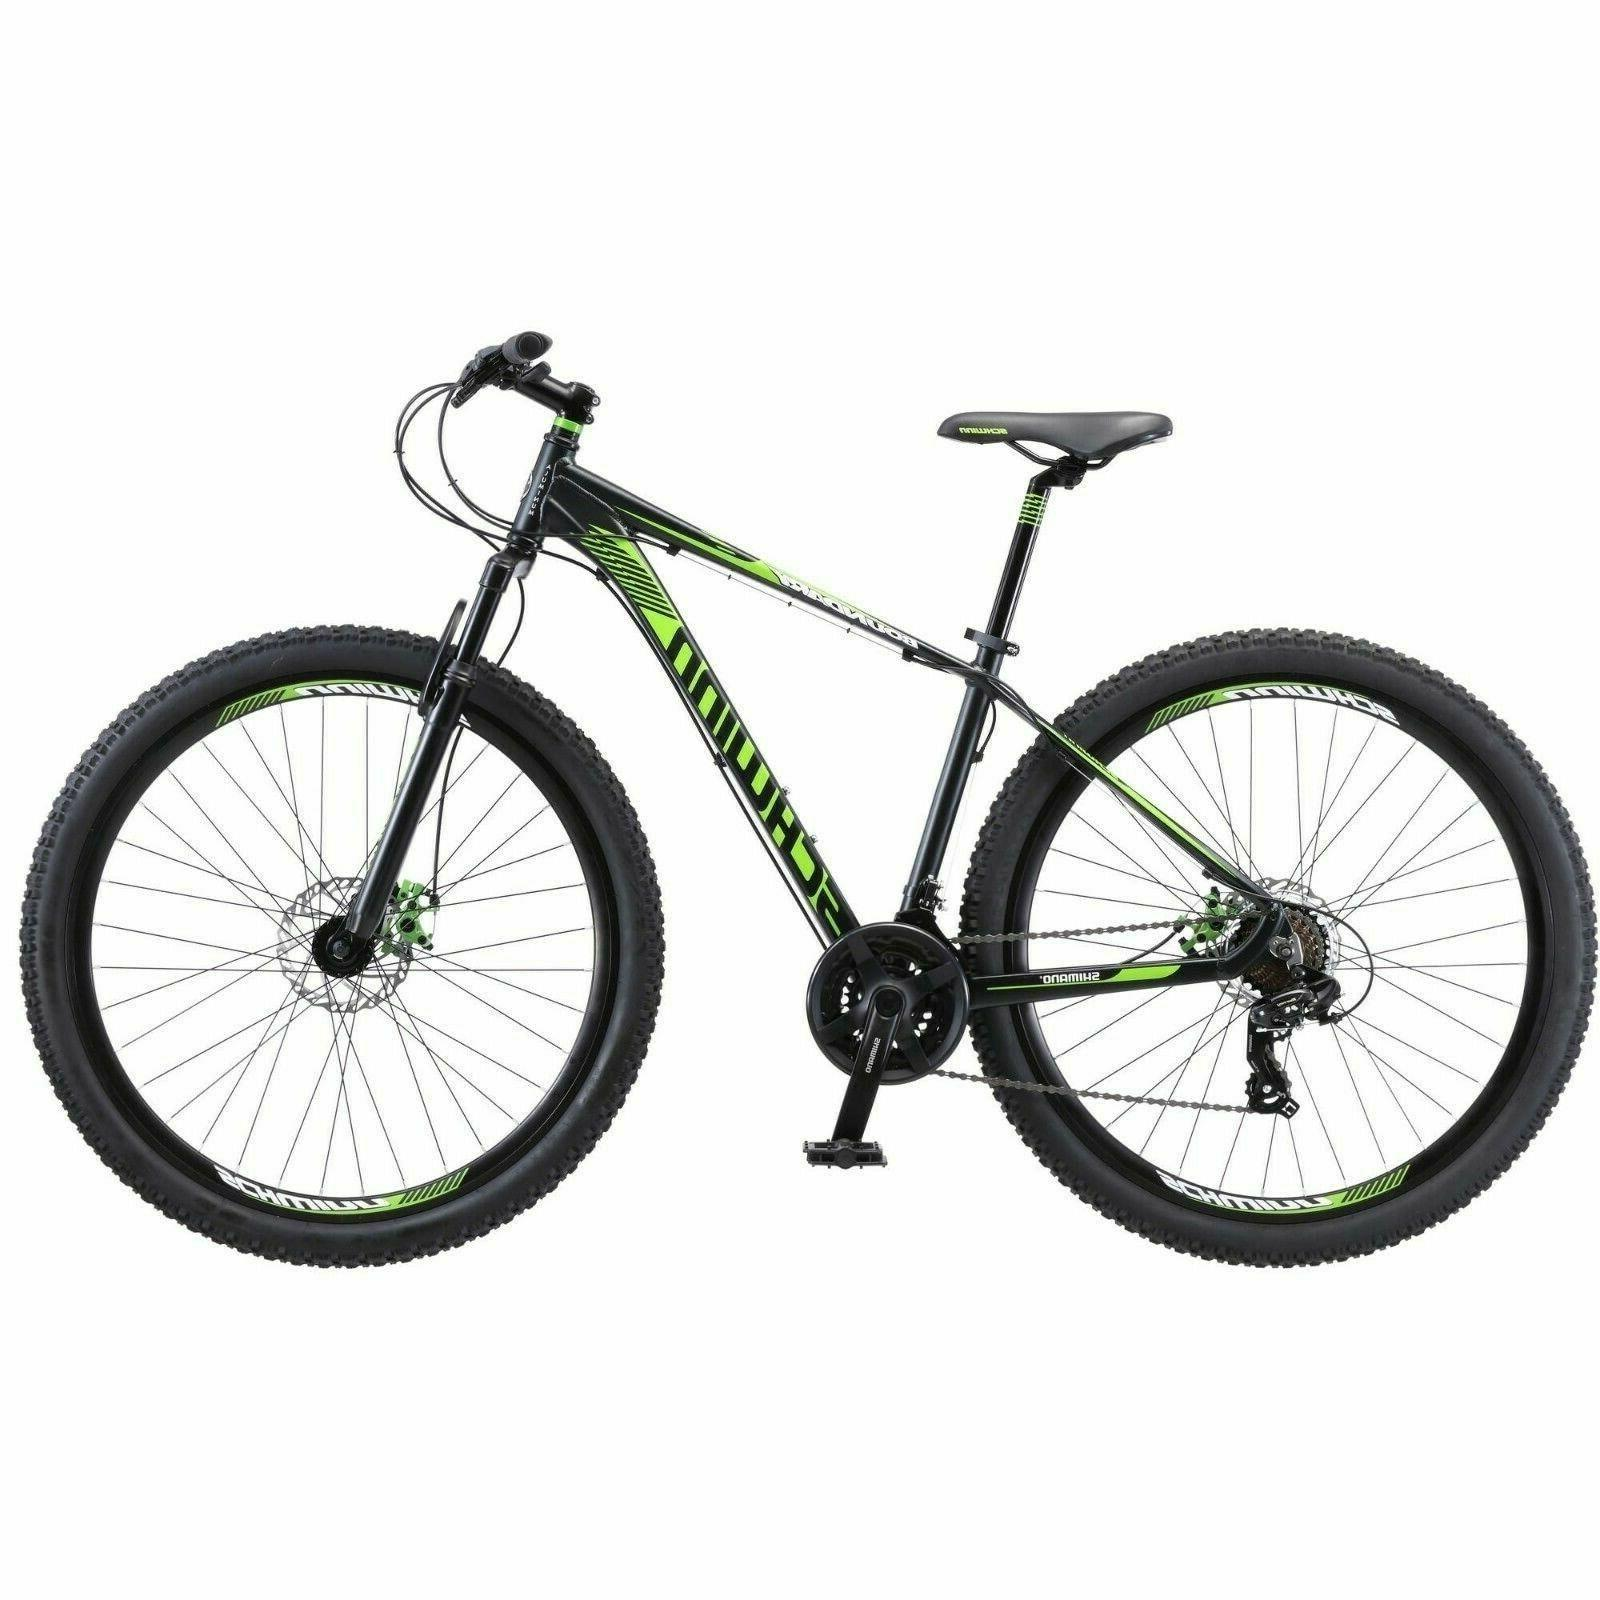 Mountain Bike Mens Schwinn 29 Inch Bicycle